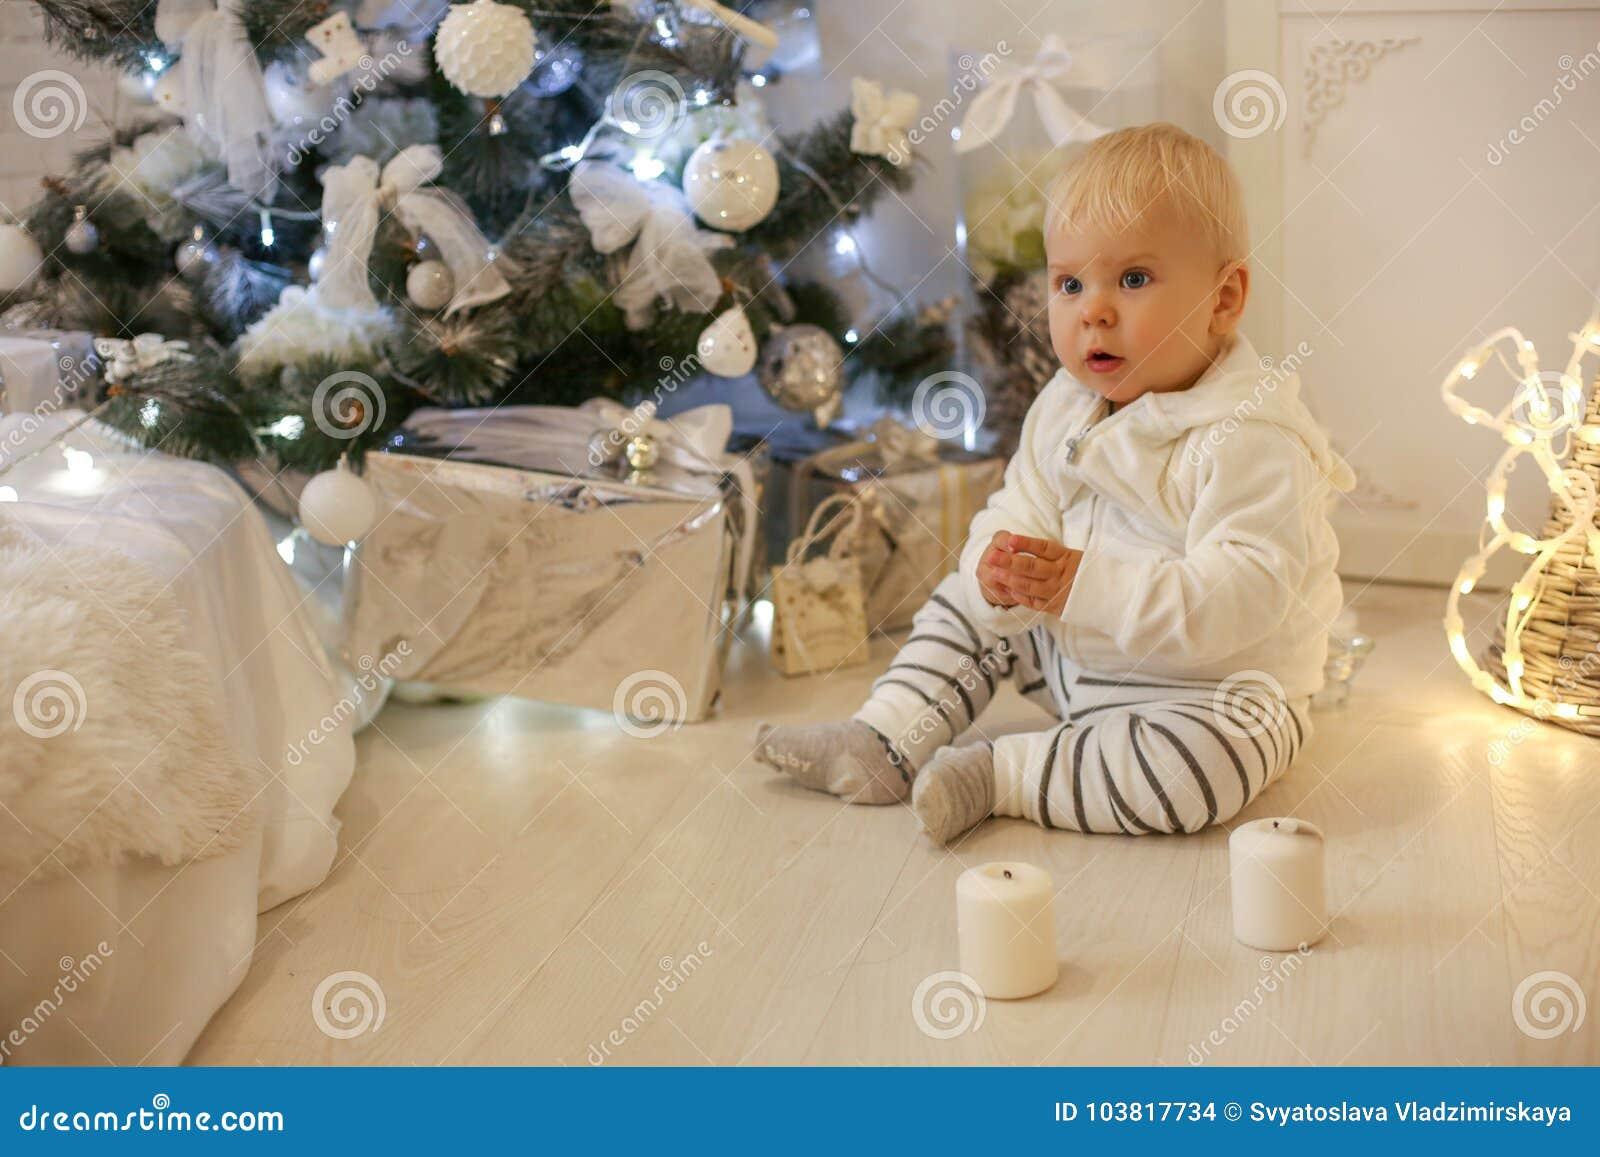 8a0a5b4b0 Cute 1 Year Old Baby Boy In Cozy Clothes